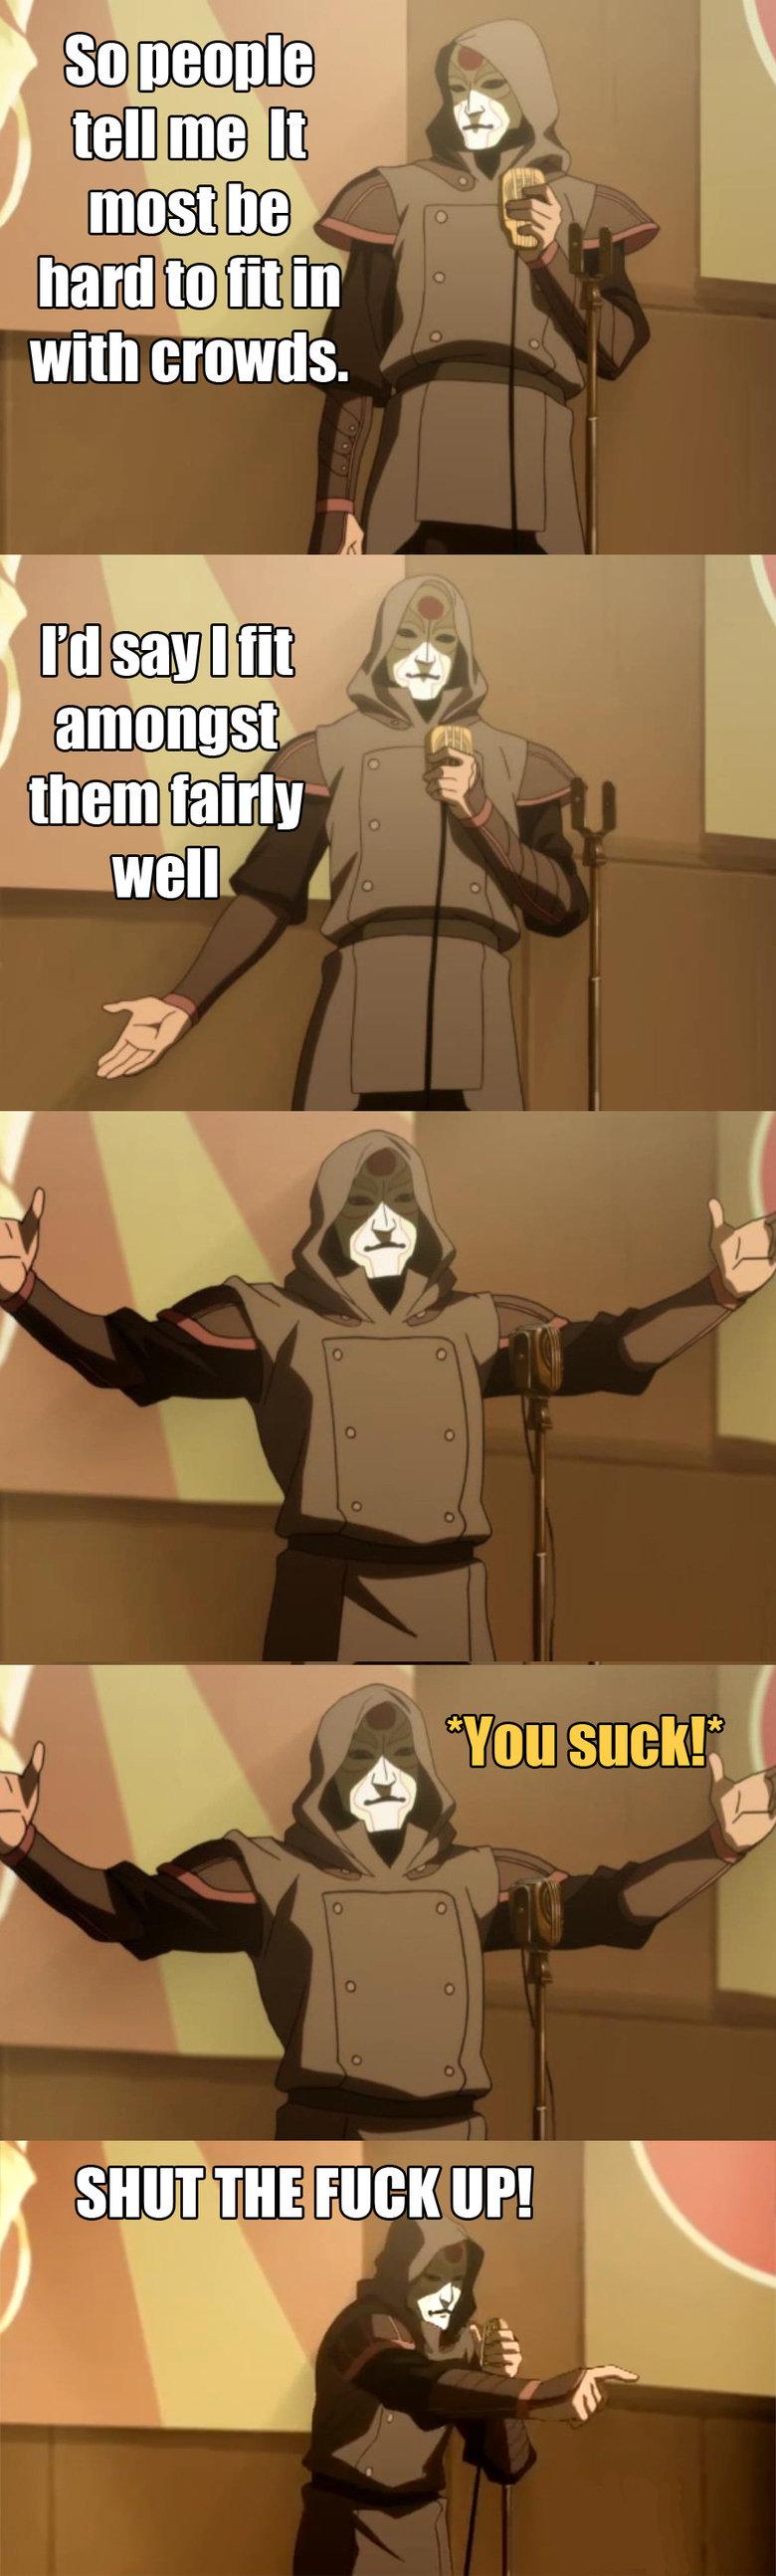 "Bad joke Amon doesn't take sht. Amon is gonna kill him. SHUT Fall} |( llp!. ""It most be hard"" ""It most be"" ""It MOST be"" no tags plz"